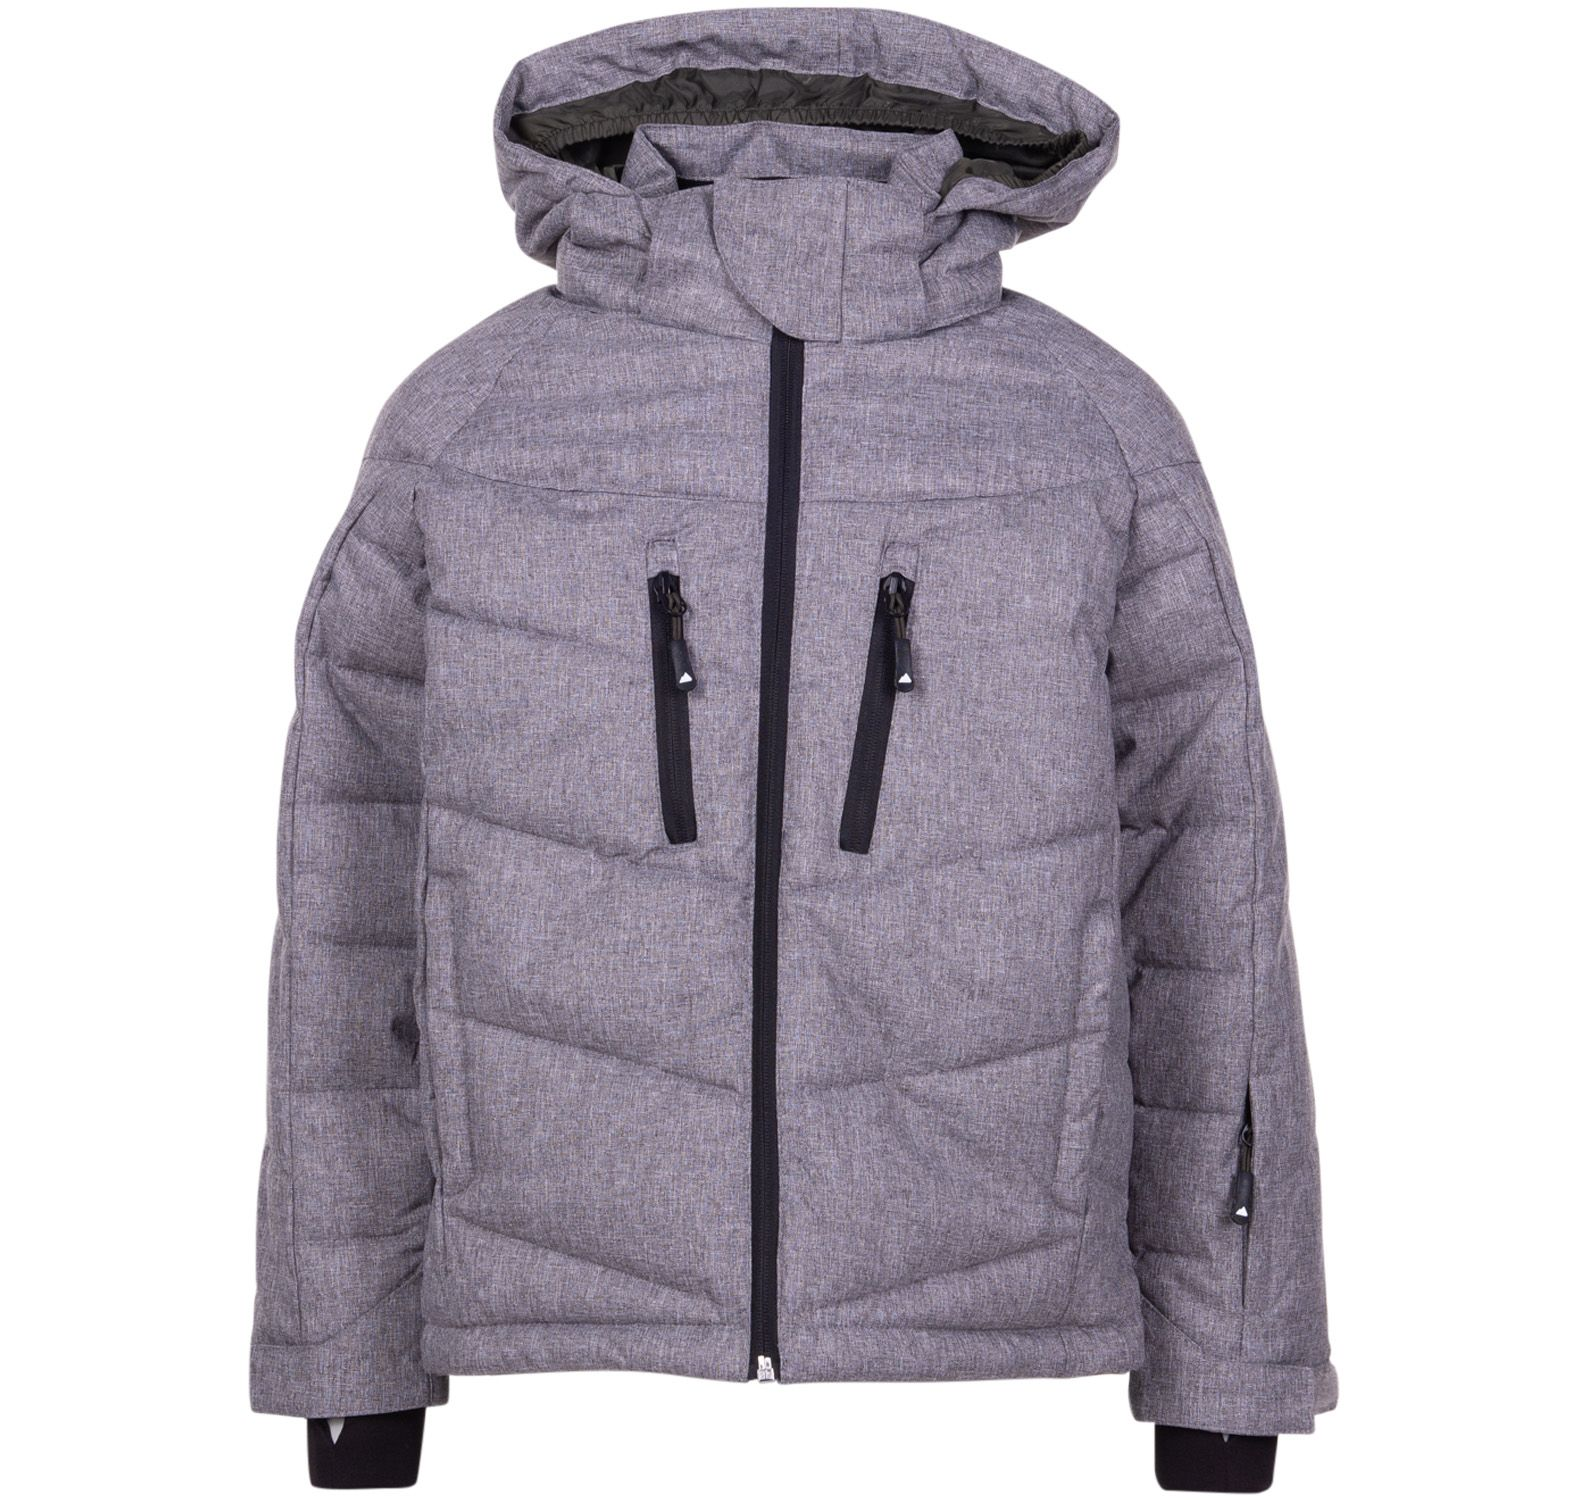 klappen 2.0 jacket, lt grey/dk olive, 120,  tuxer